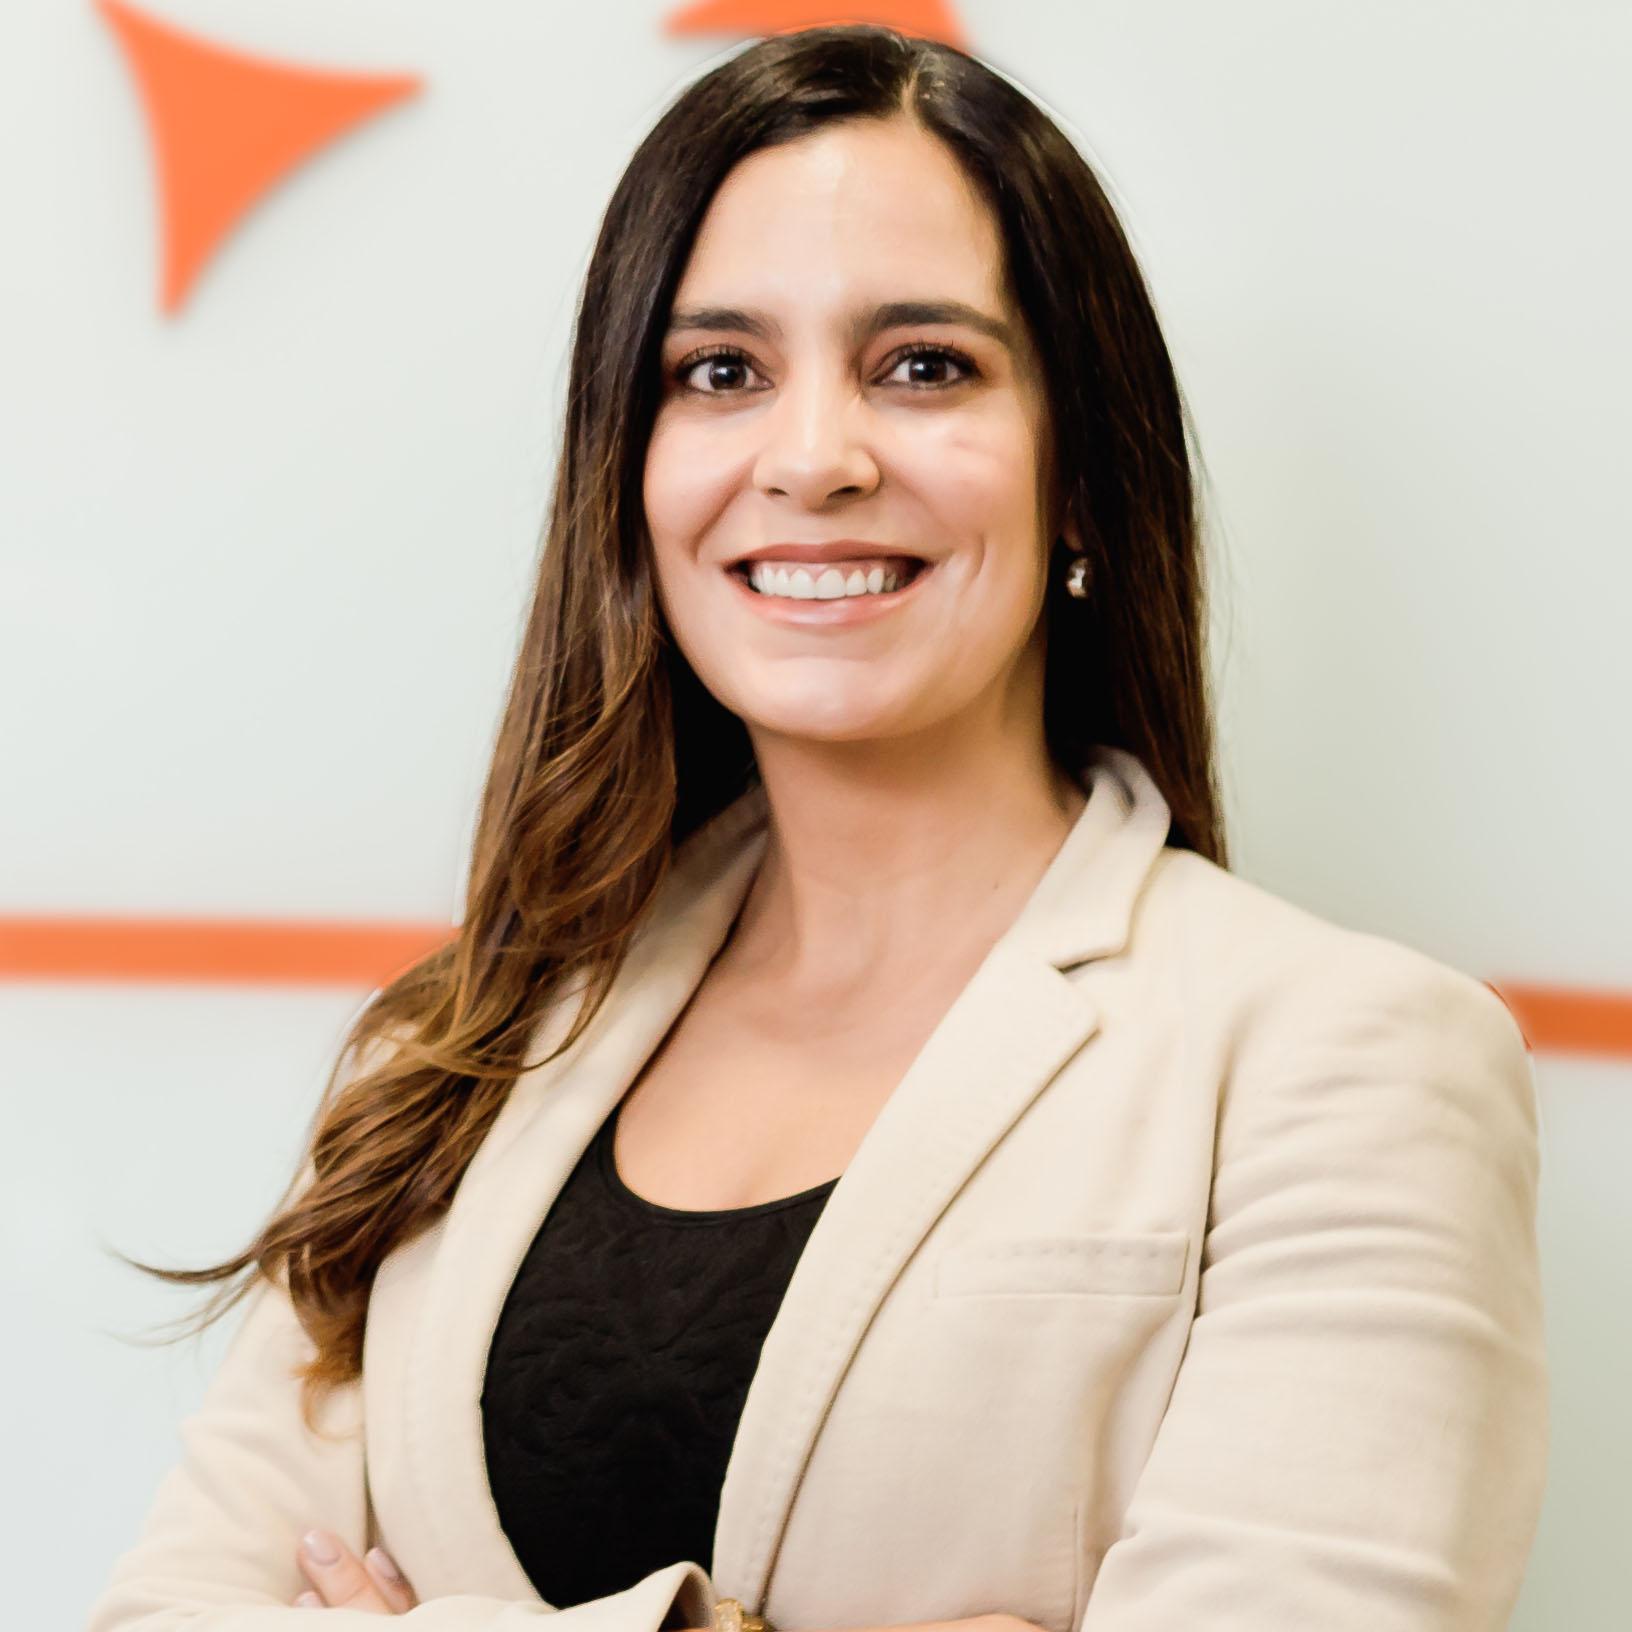 Nathalia Succar Jaramillo